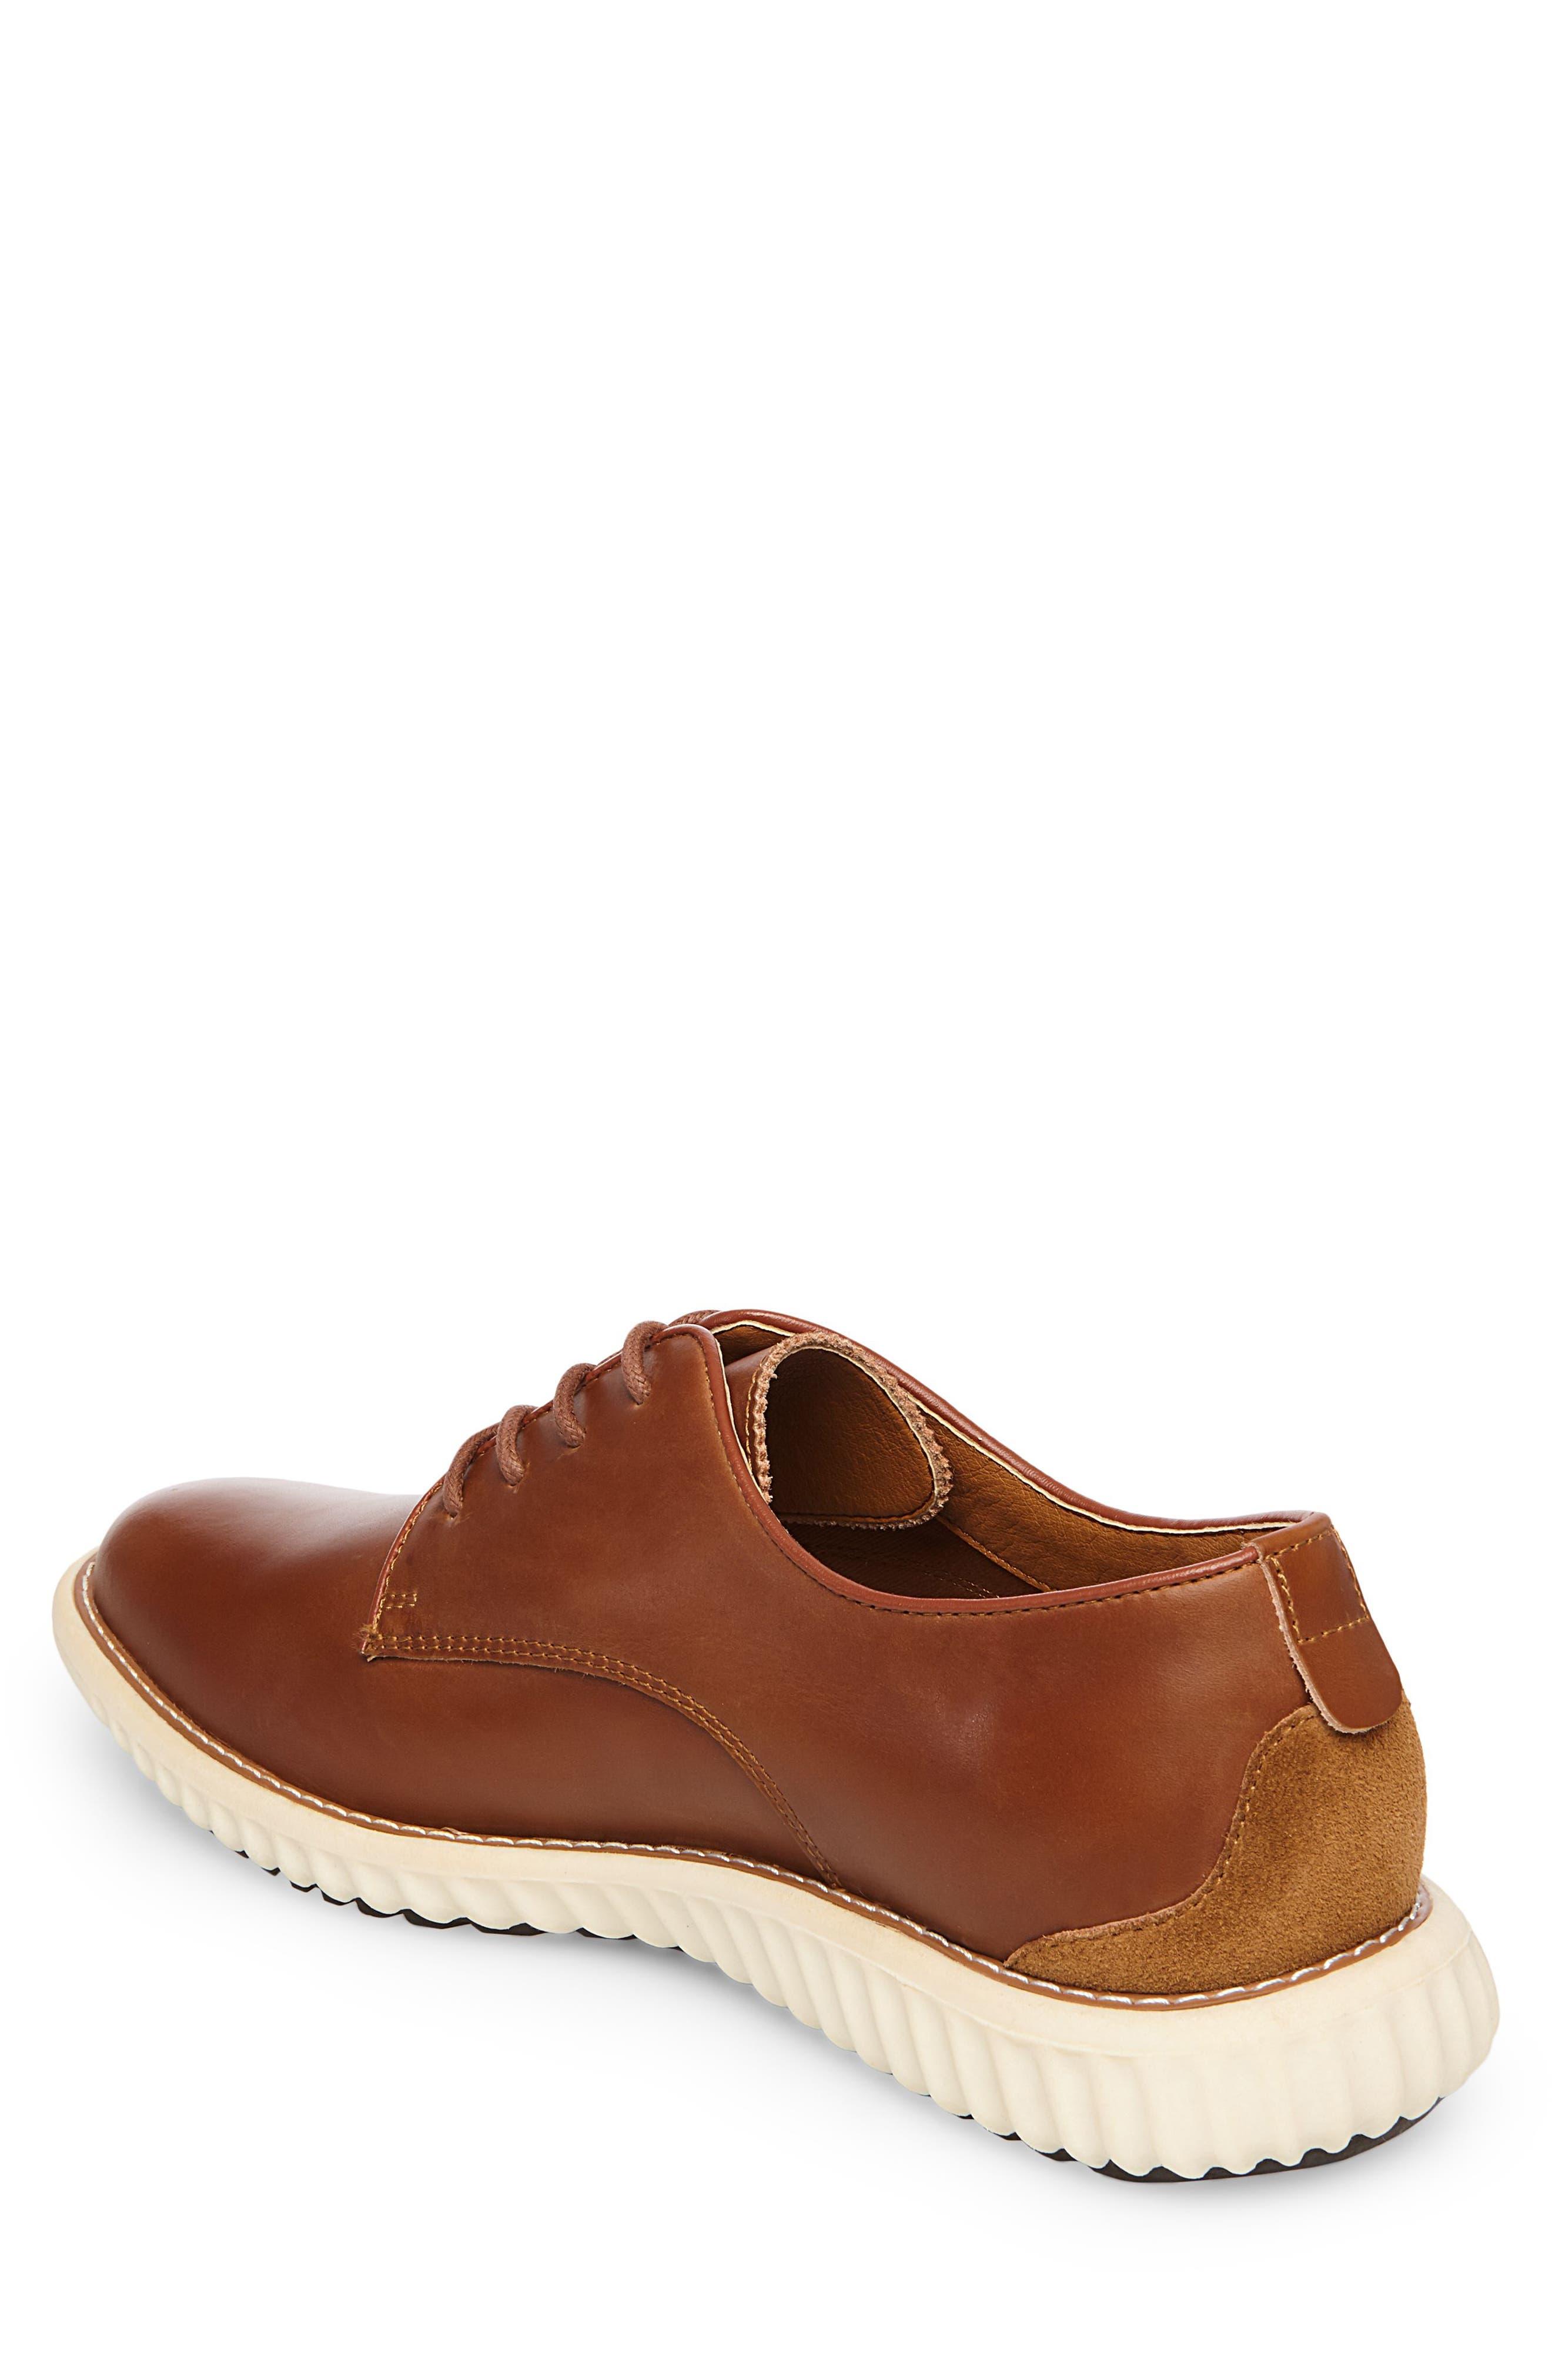 Vance Sneaker,                             Alternate thumbnail 2, color,                             Tan